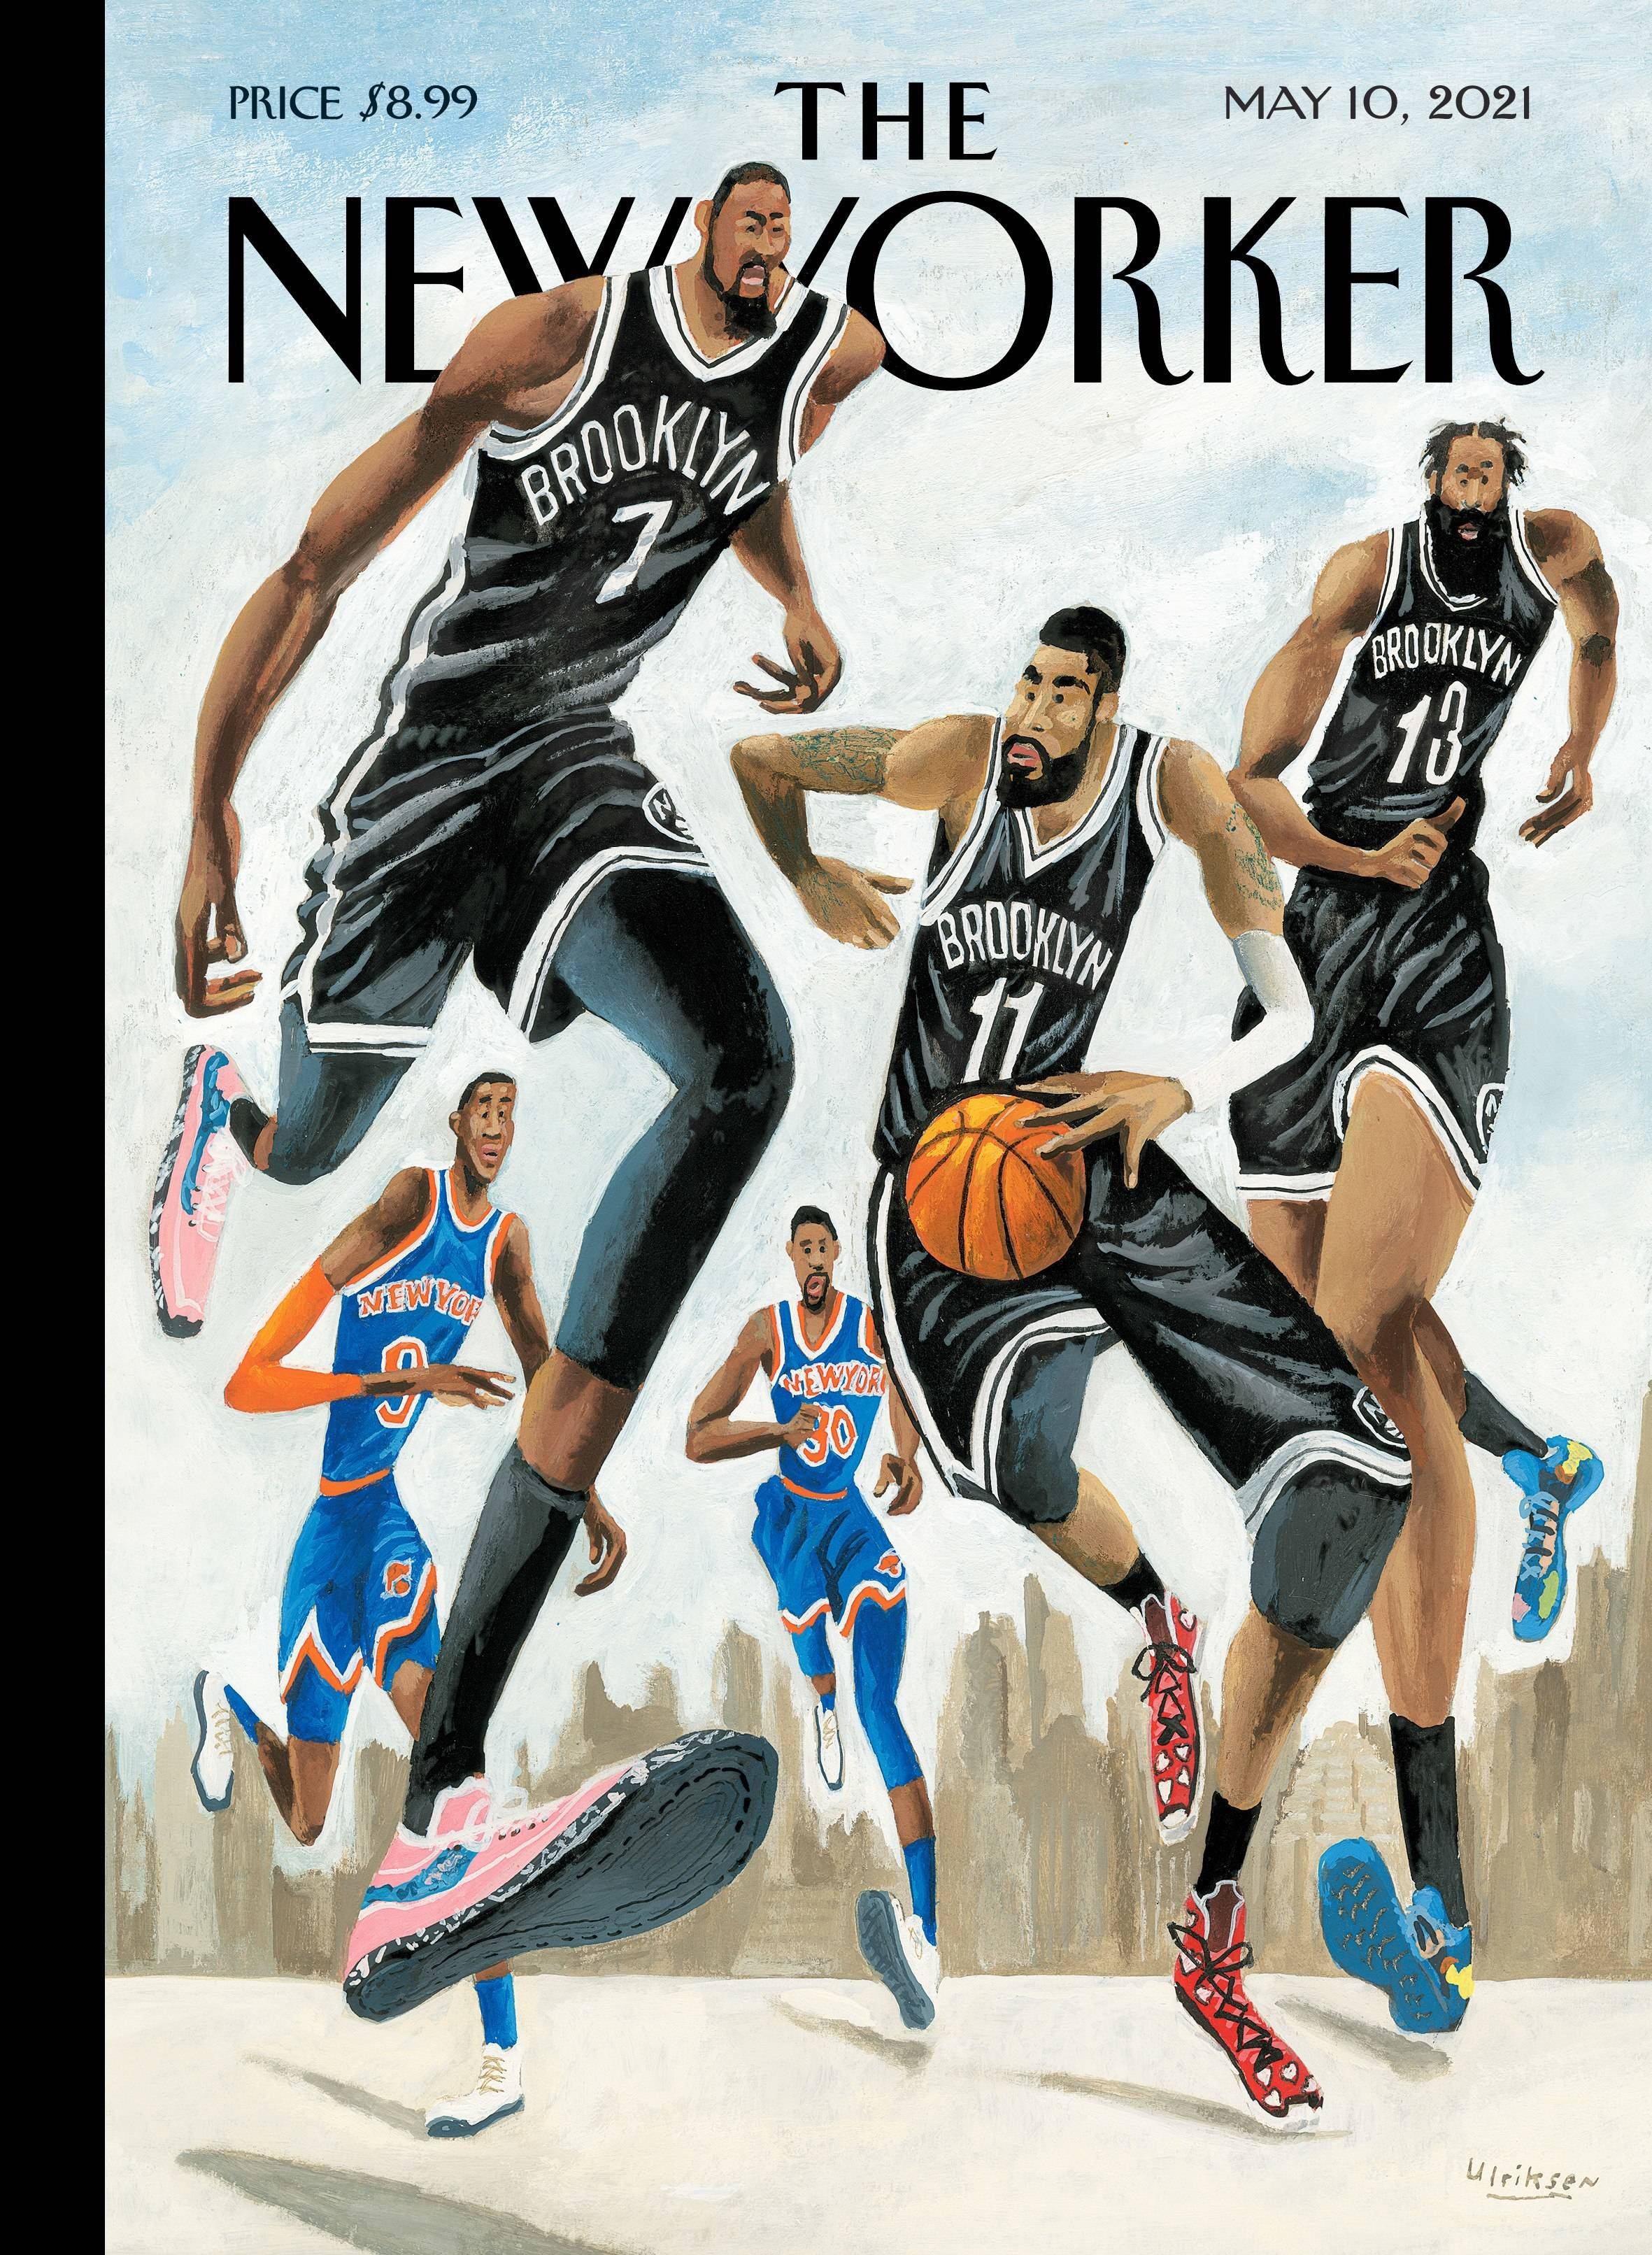 New Yorker Magazine April 20, 2020